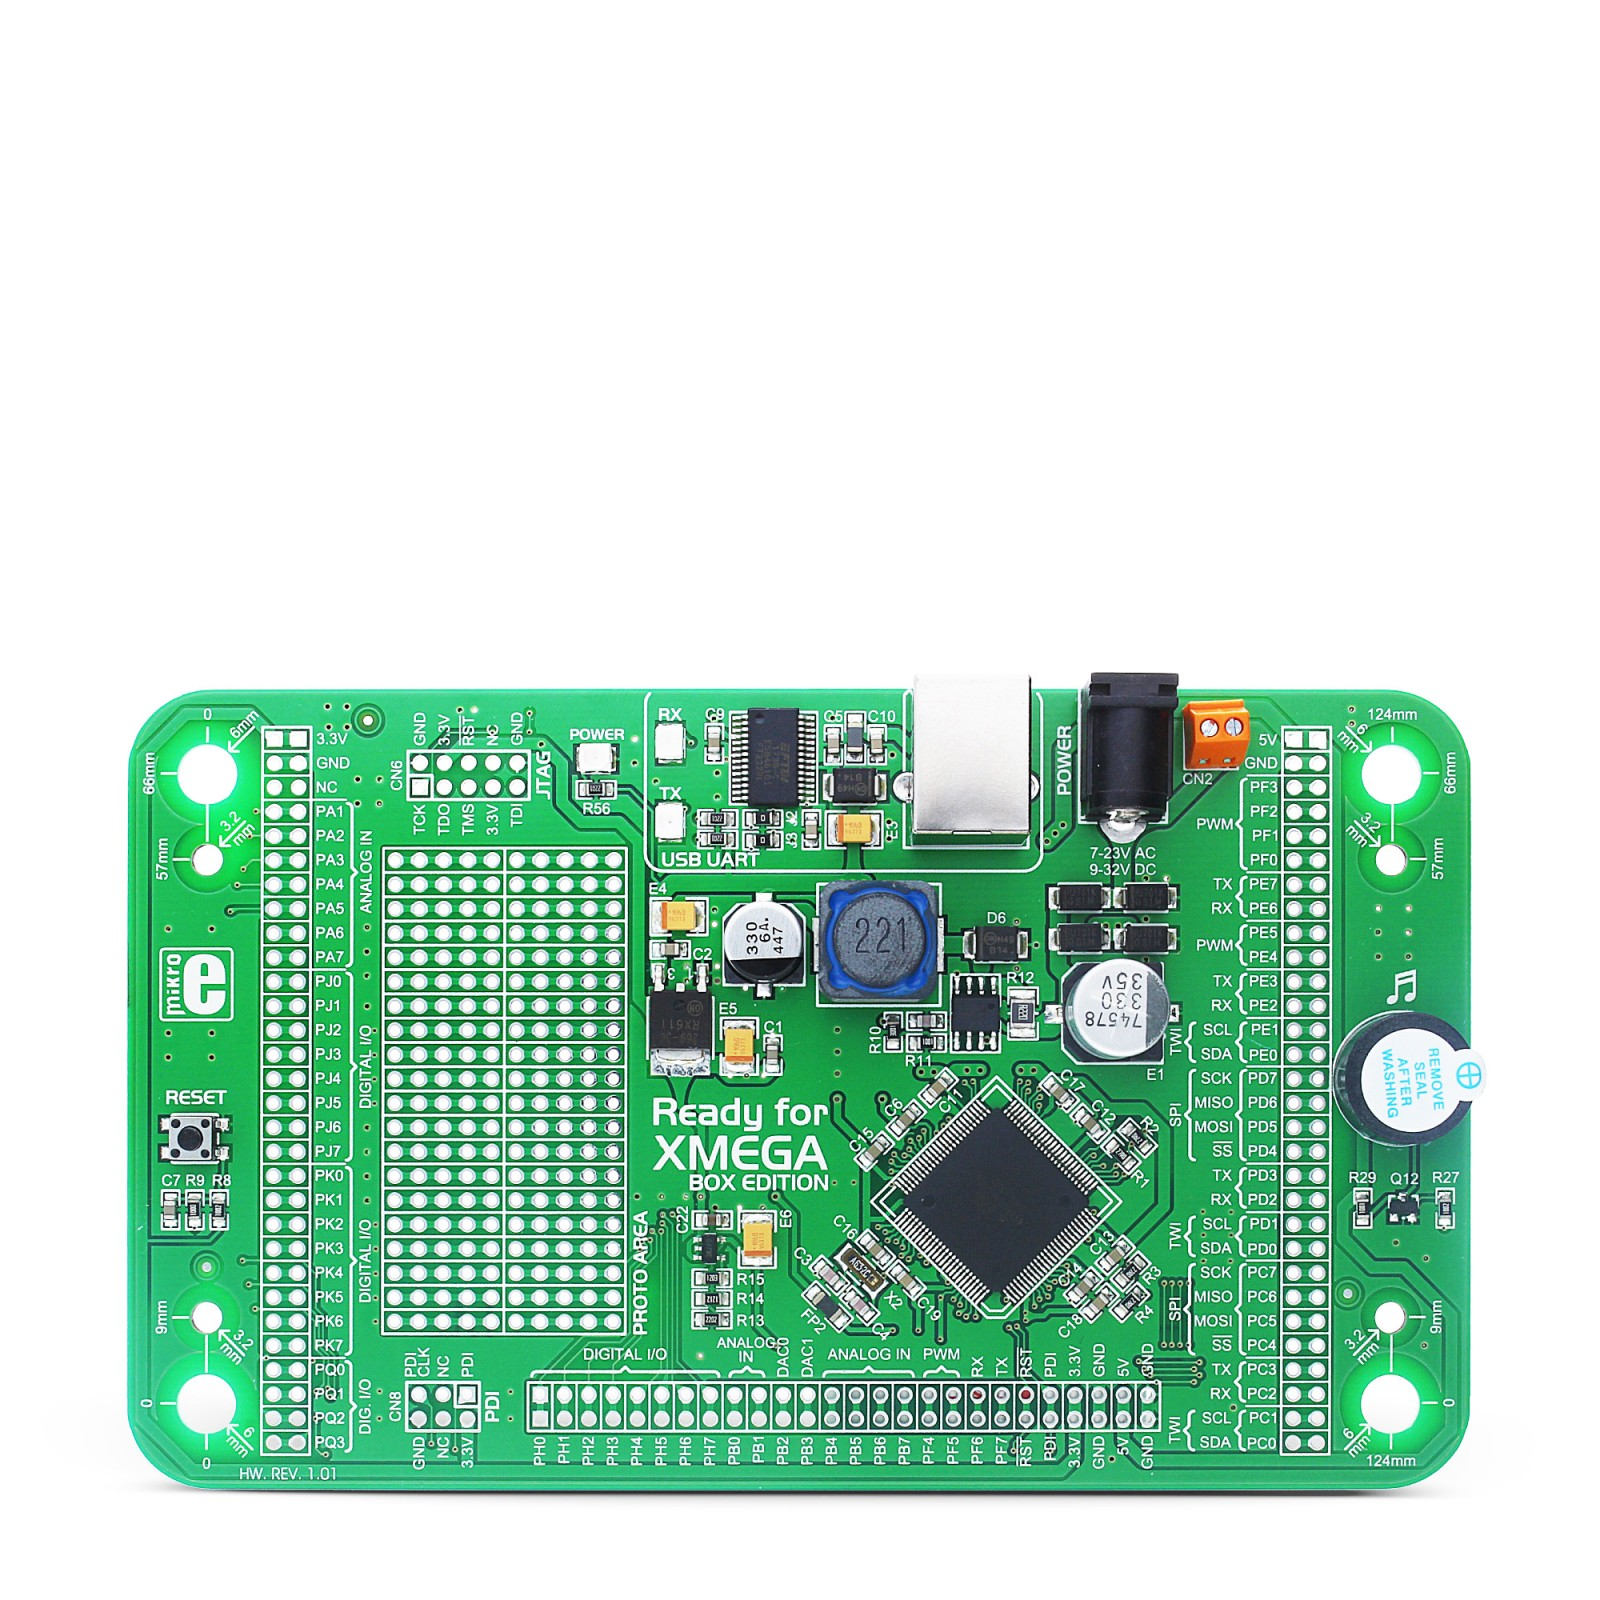 Ready For Xmega Avr Development Board Usb Player Circuit Diagram Also Pic Programmer On Mgctlbxnmzp Mgctlbxv5112 Mgctlbxlc Mgctlbxpprestashop